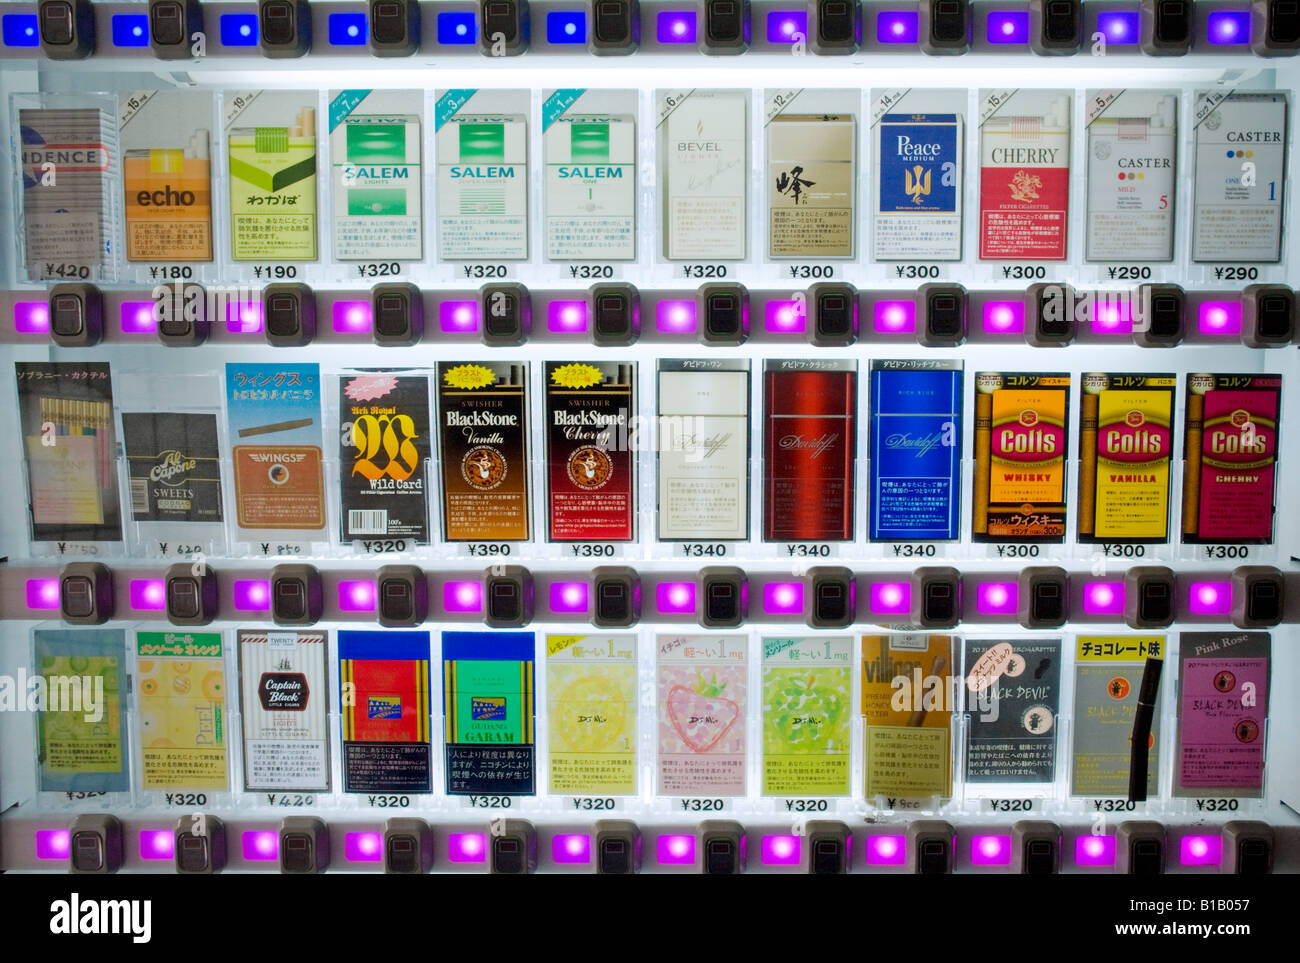 Buy cigarettes Sobranie USA made